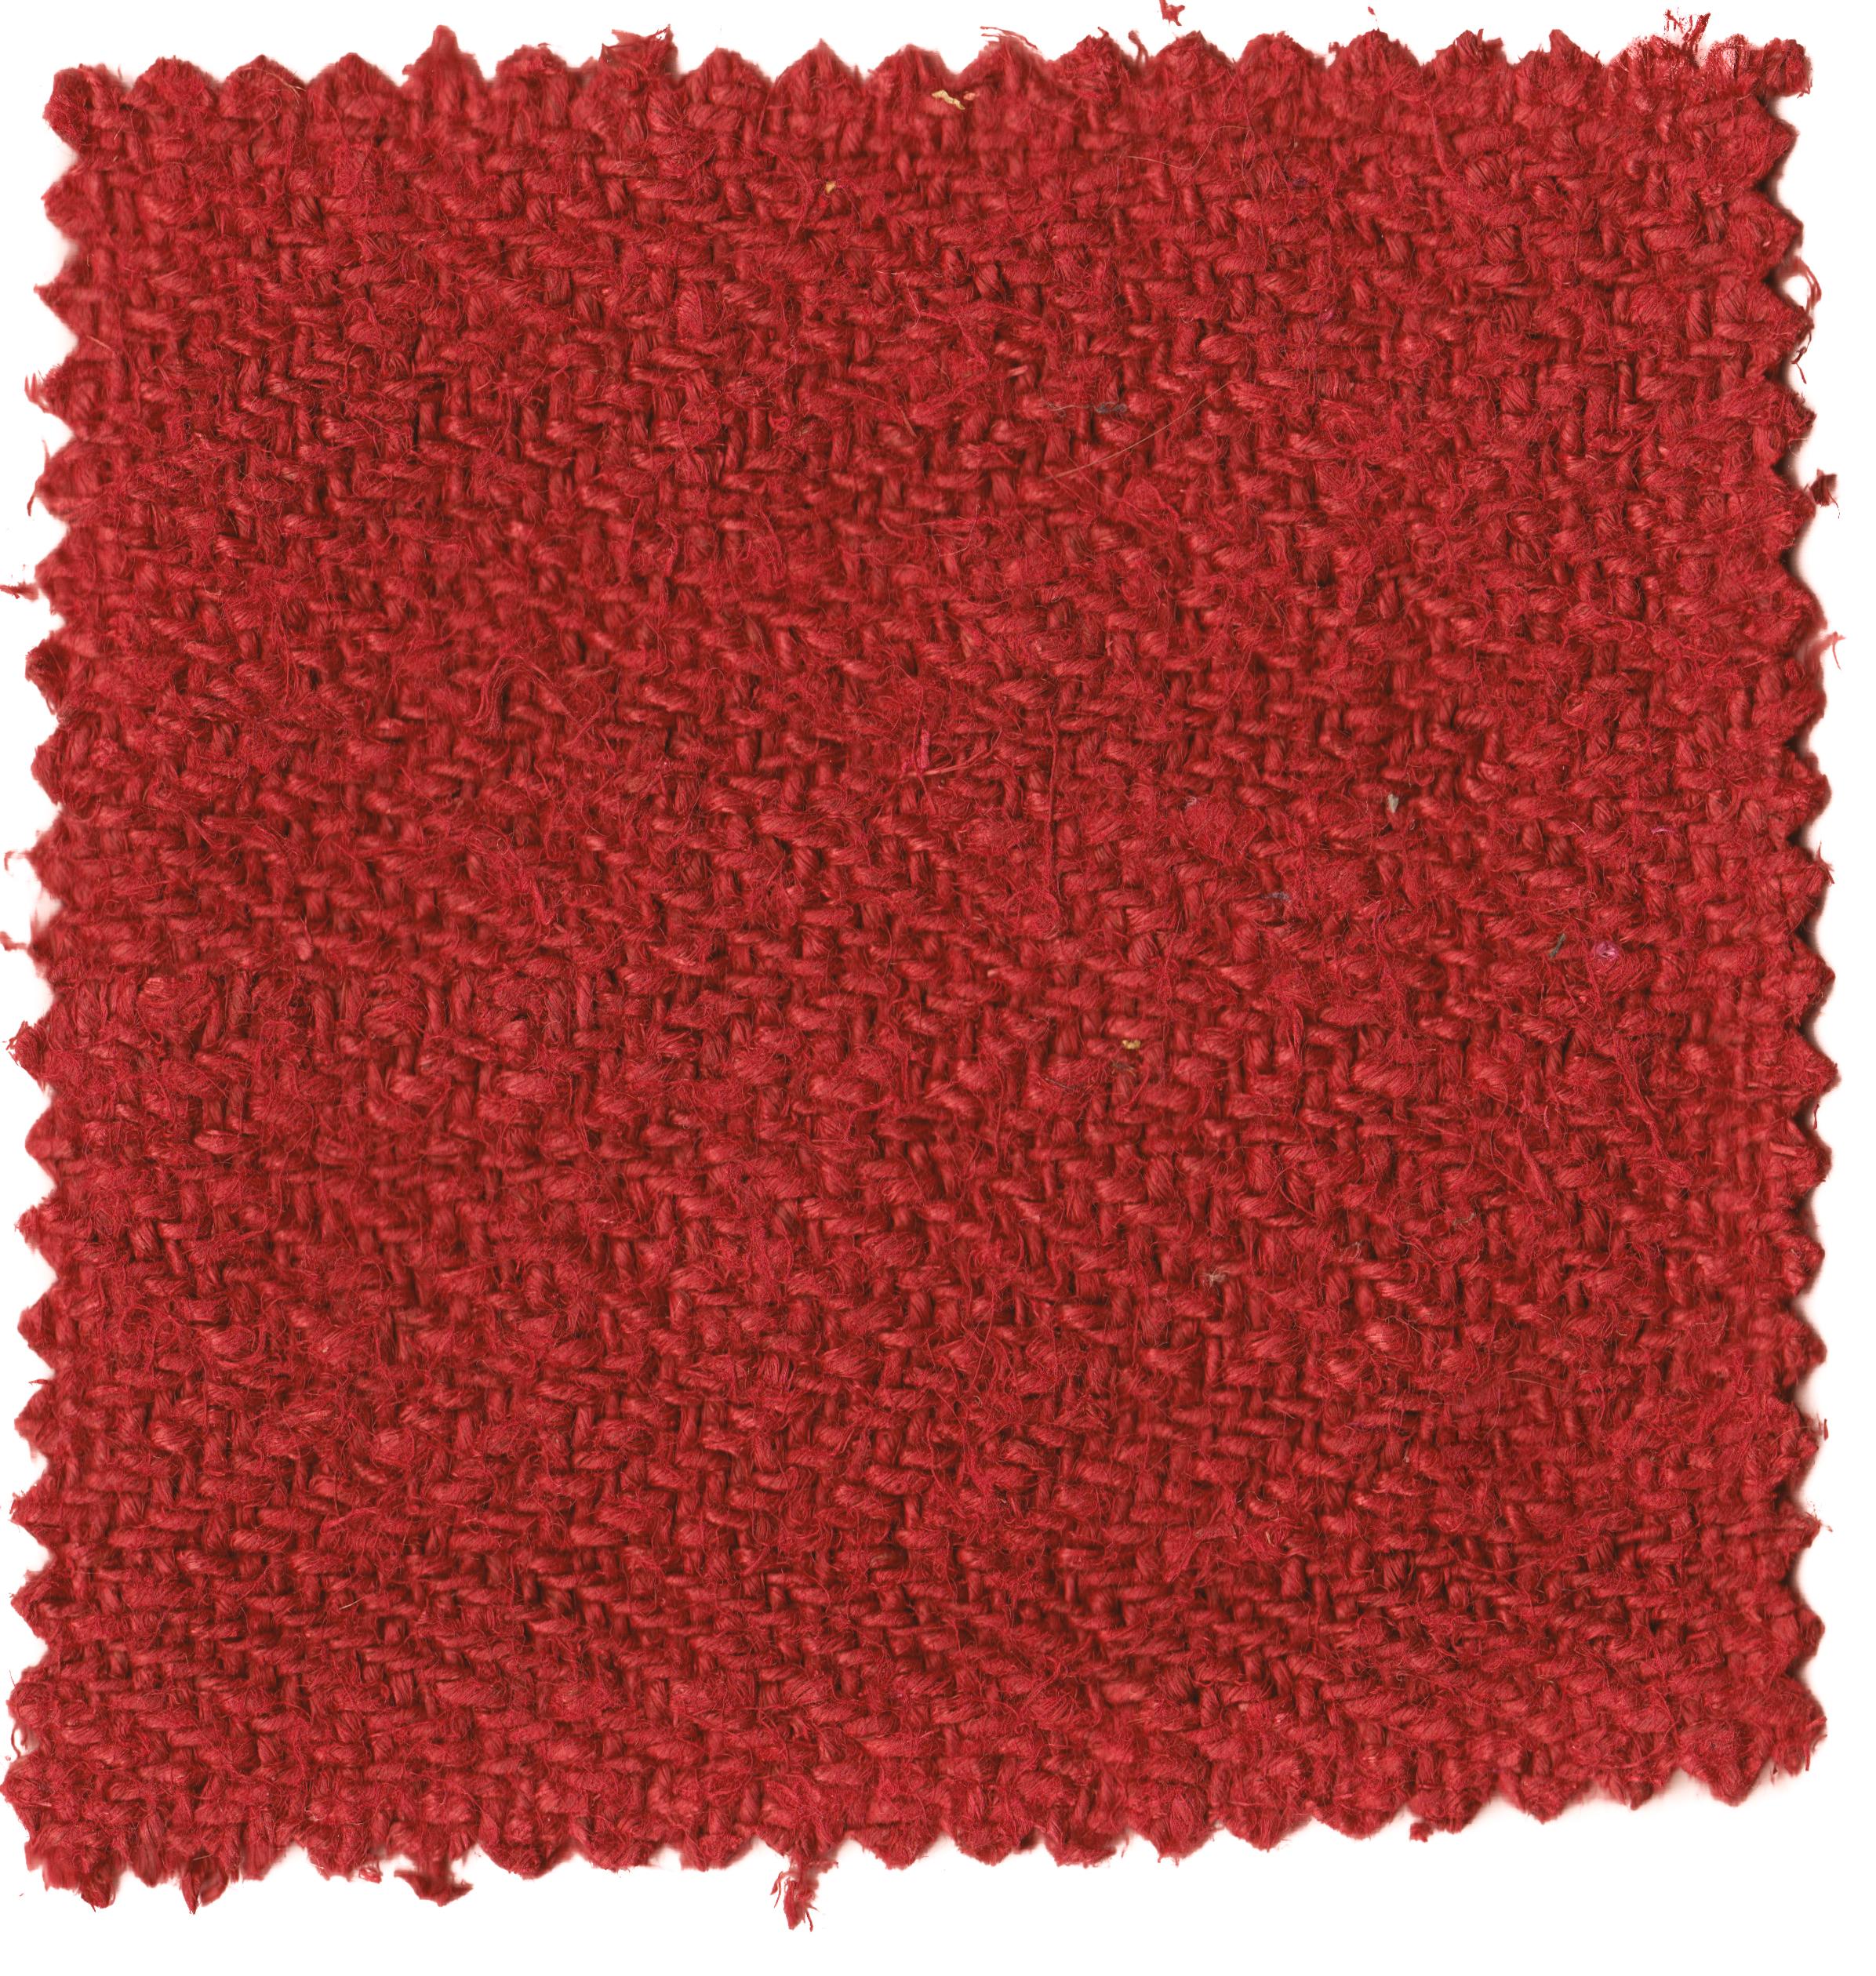 Flame Reds-2.jpg